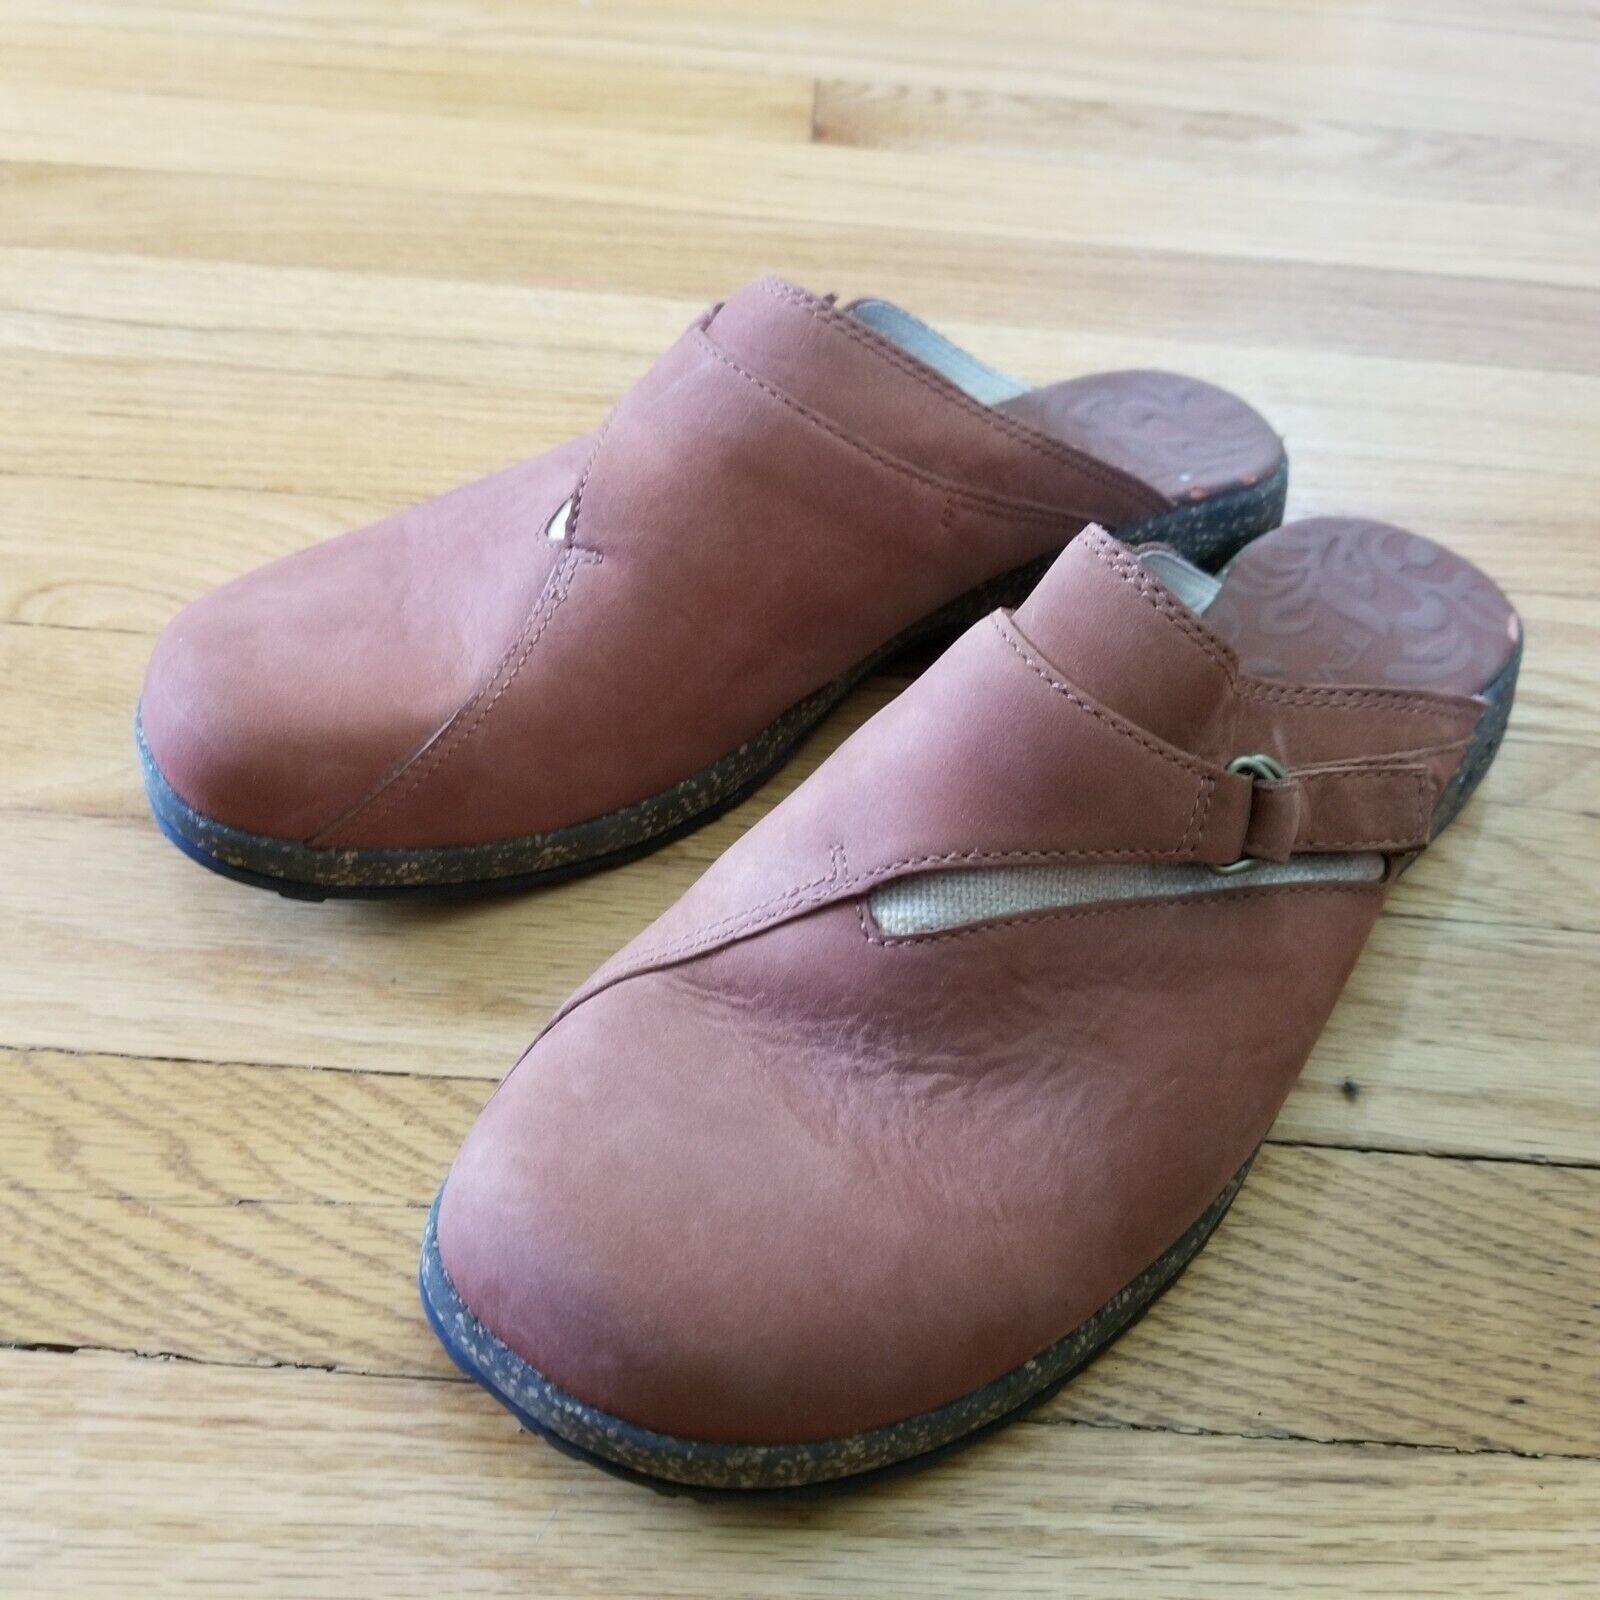 Teva Shoes Clogs Slides Women Leather Brown US 10 / EU 41